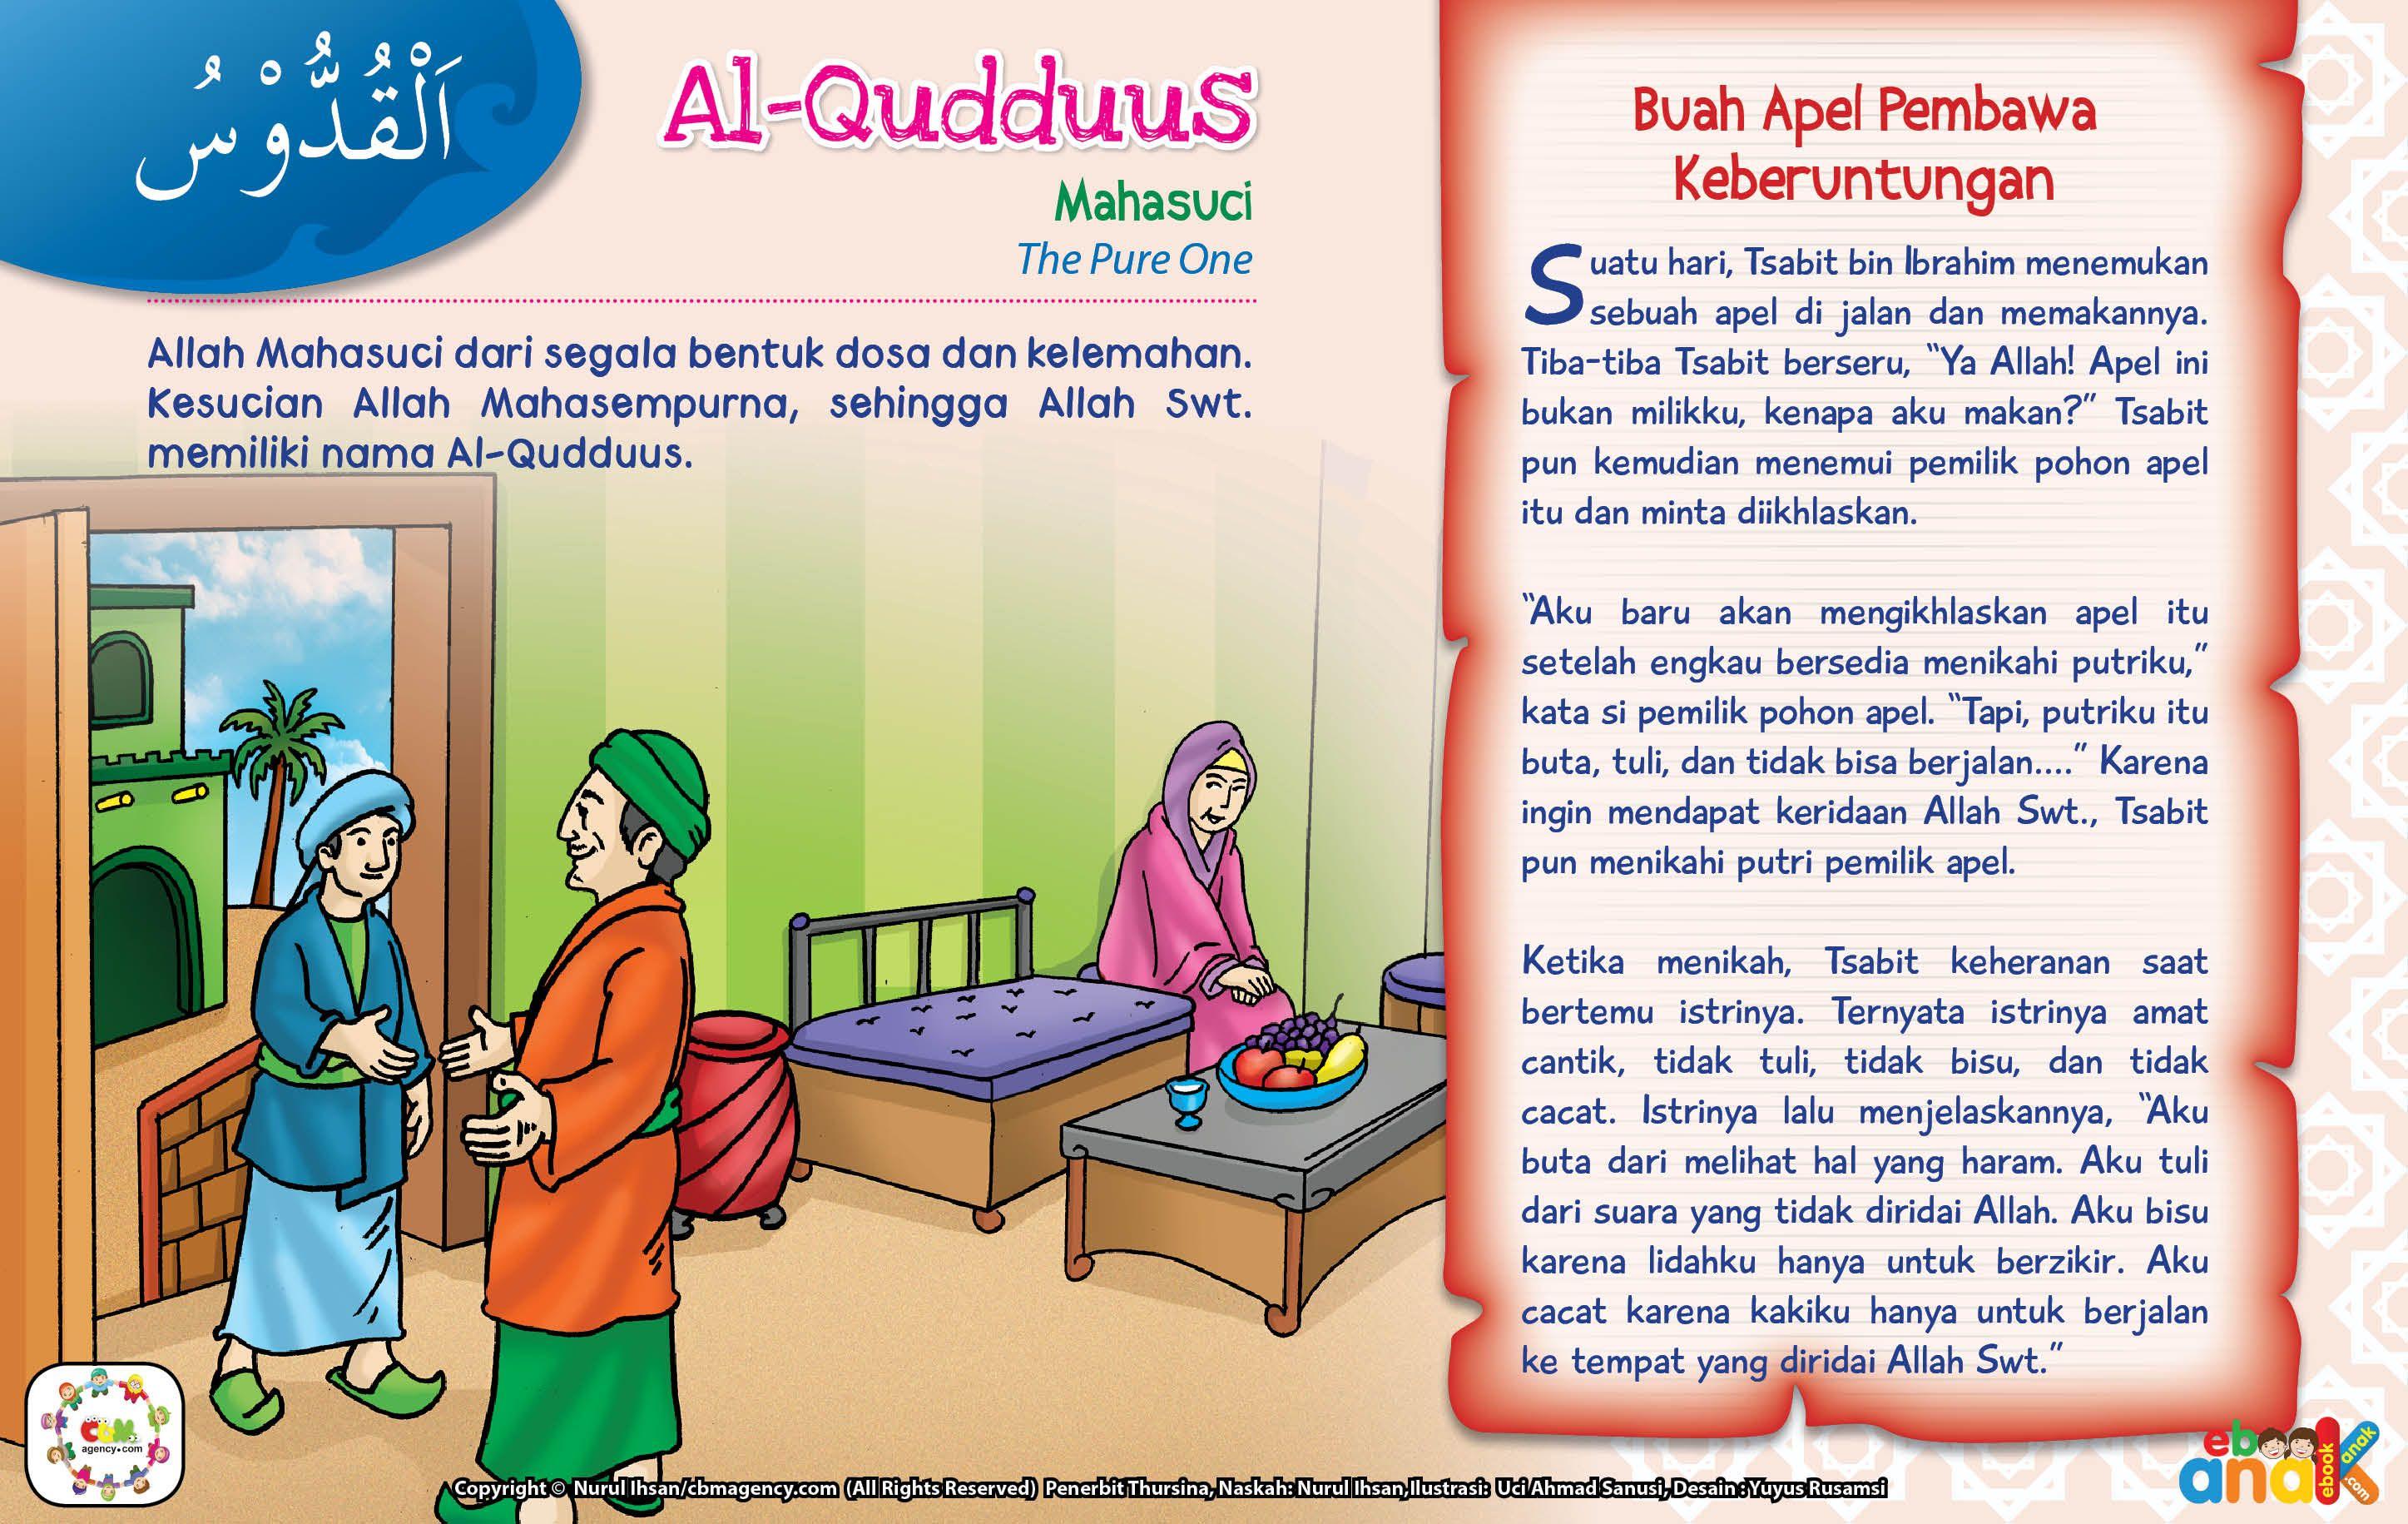 AlQudduus Mahasuci (The Pure One)Allah Mahasuci dari